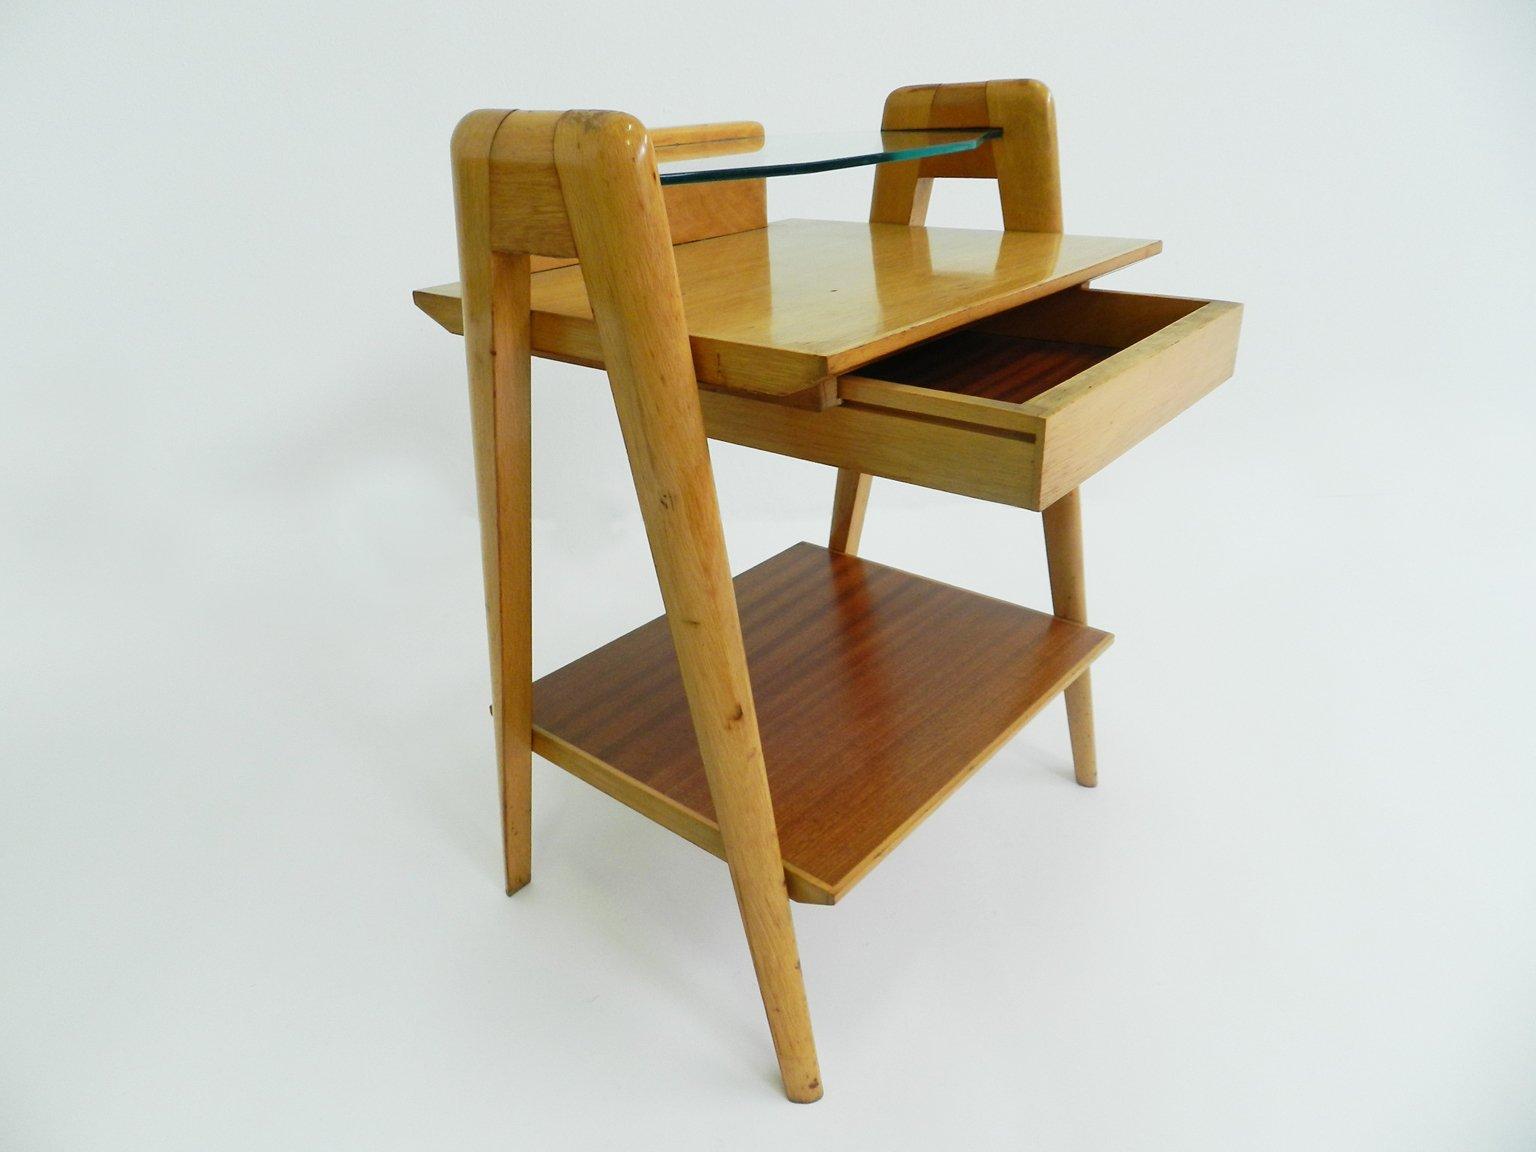 table de chevet mid century italie en vente sur pamono. Black Bedroom Furniture Sets. Home Design Ideas